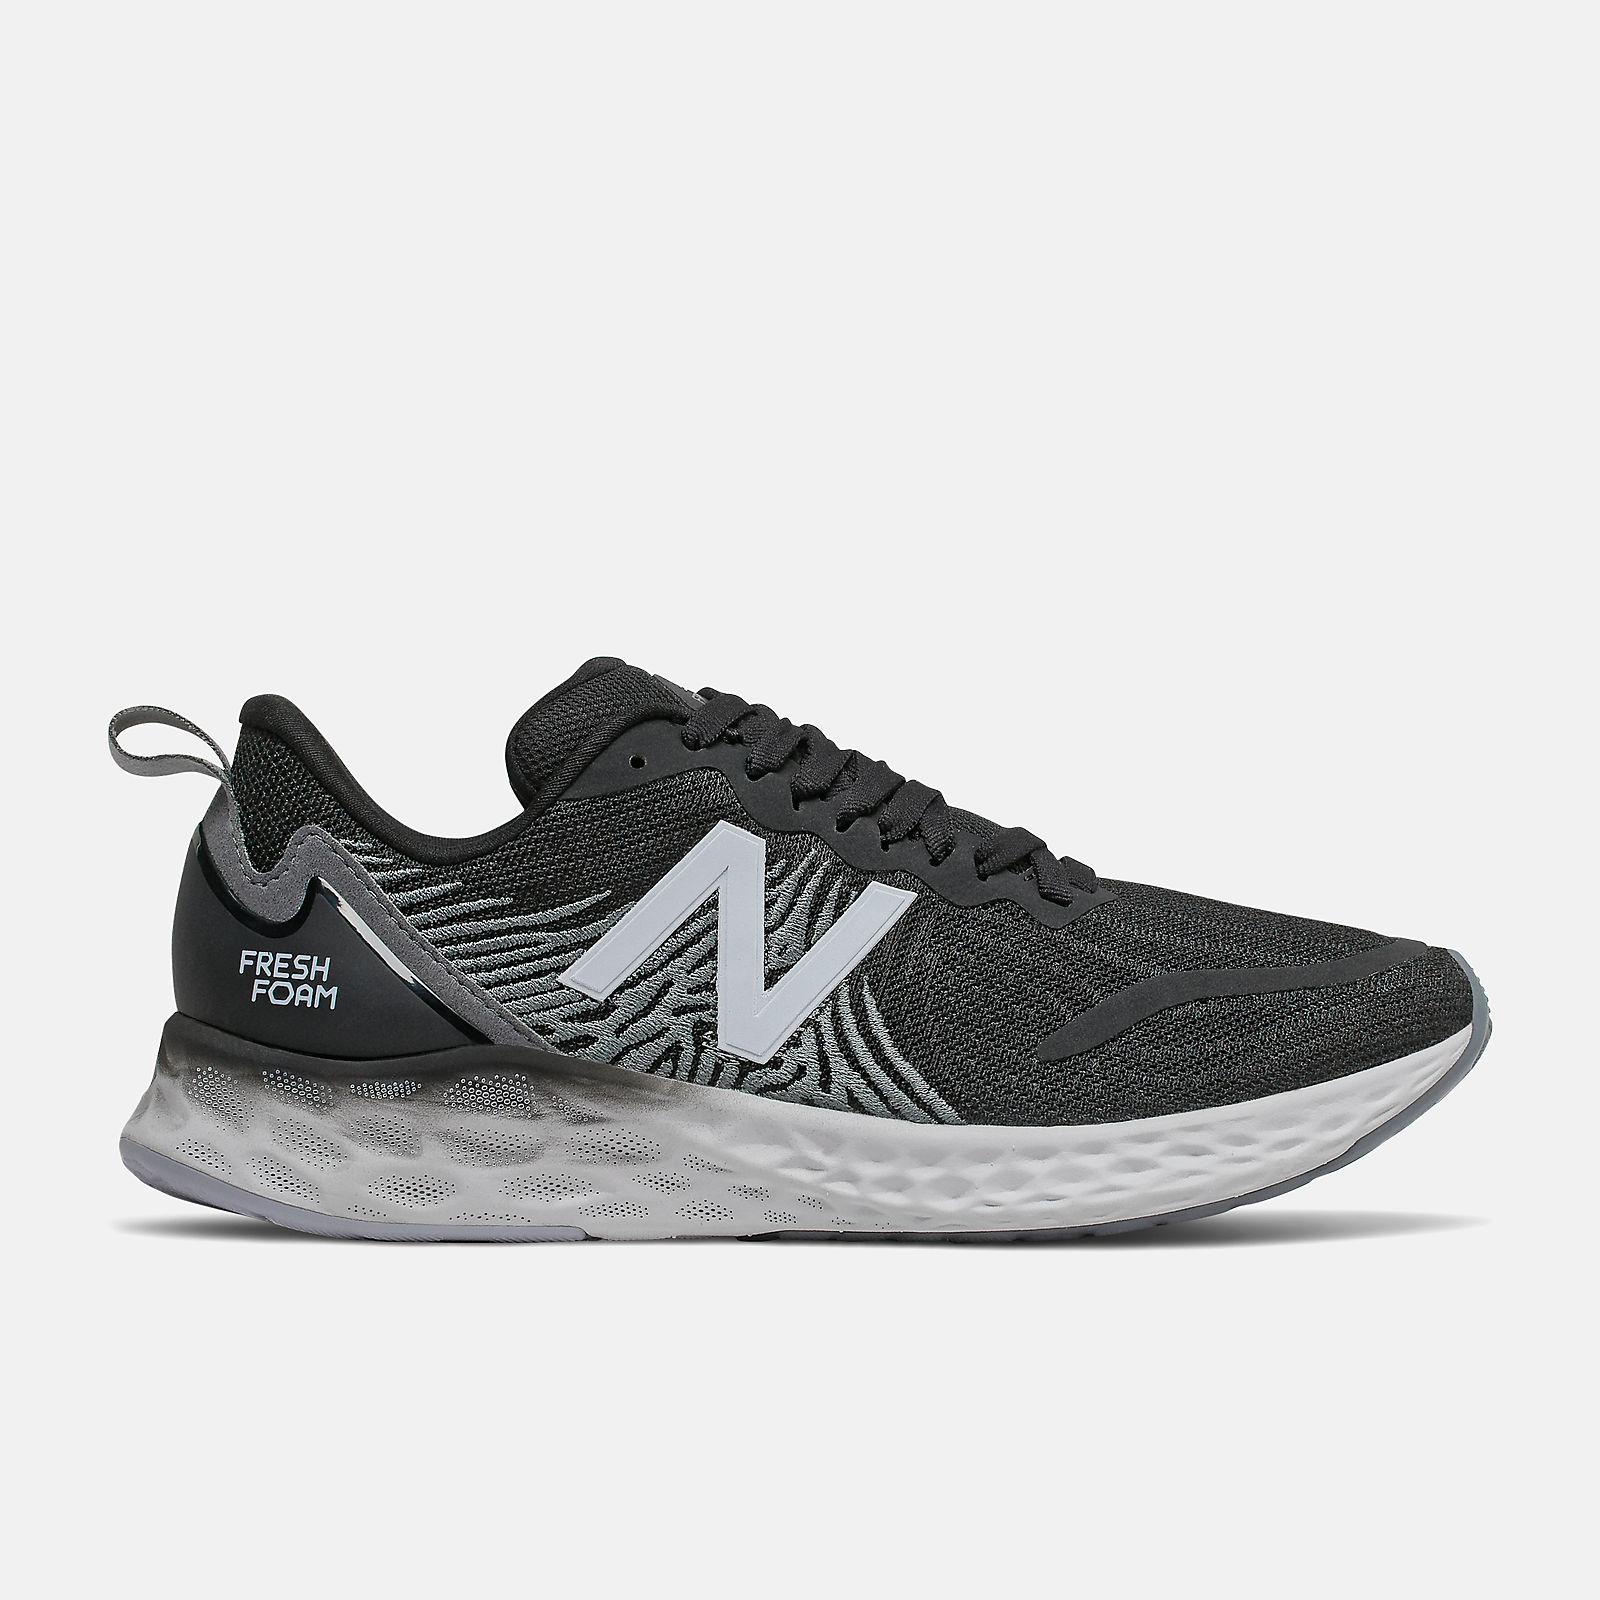 new balance trainers size 2